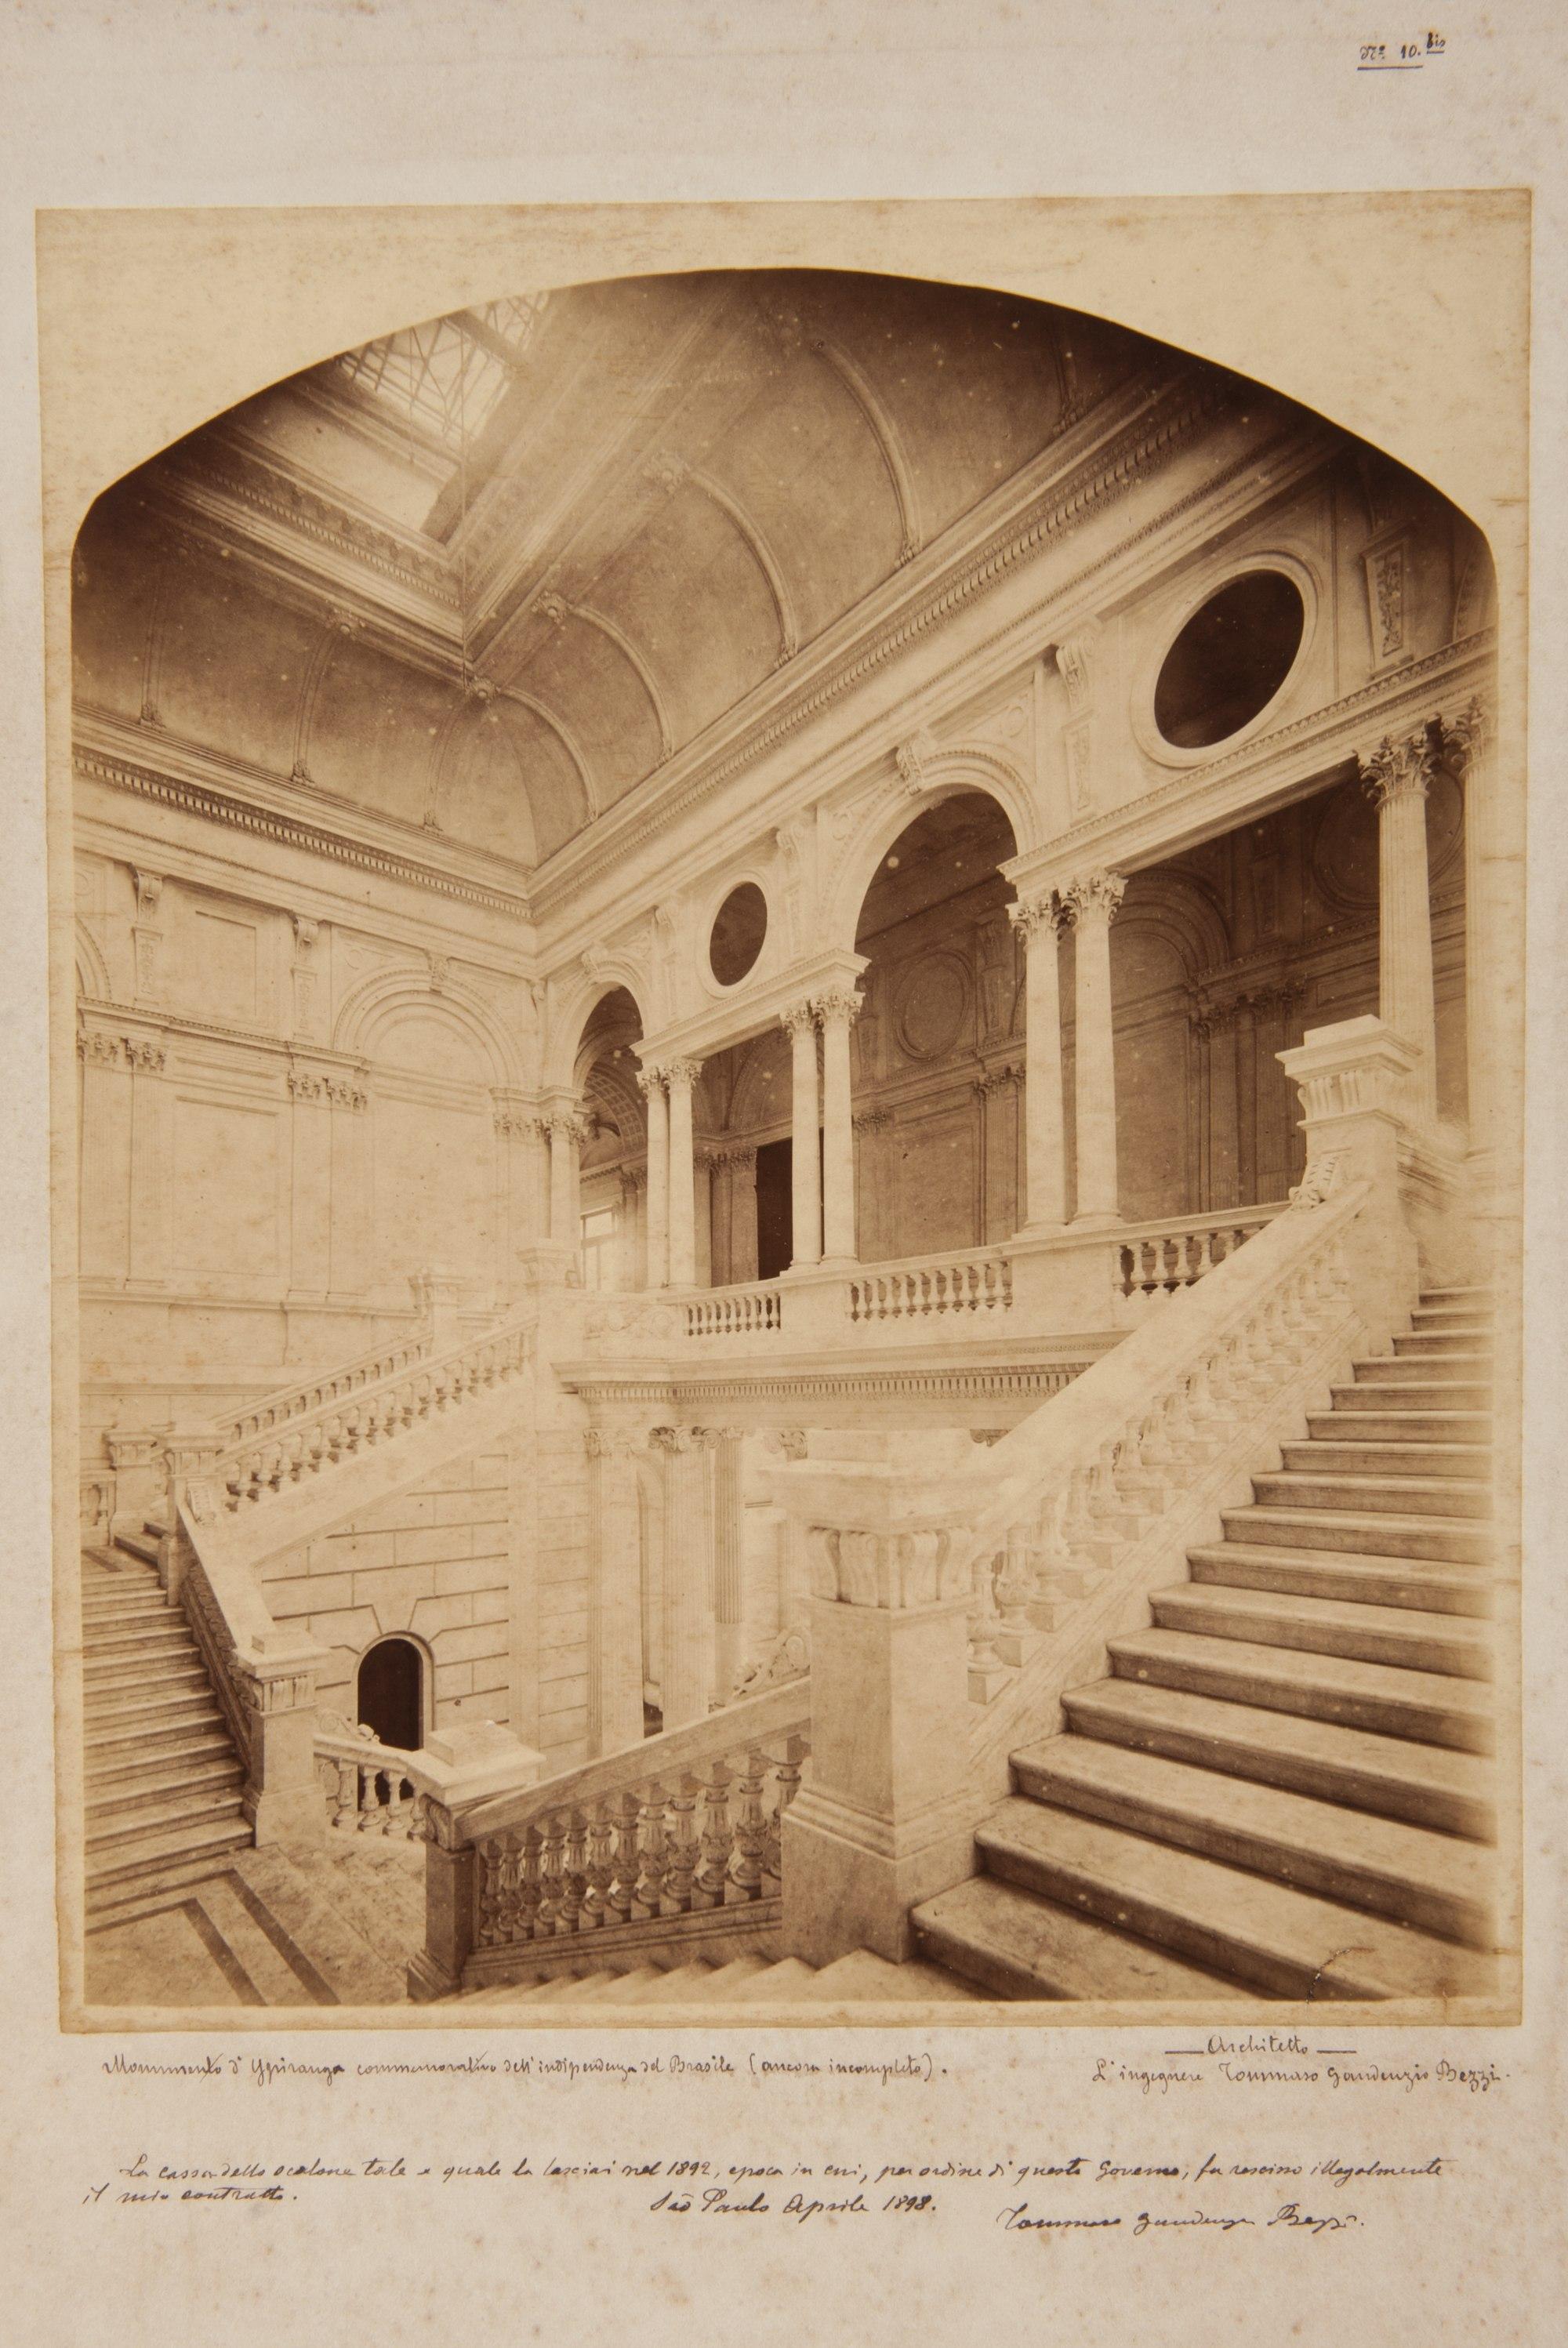 Interior do Edifício-monumento do Ipiranga: Andar superior visto da escadaria central